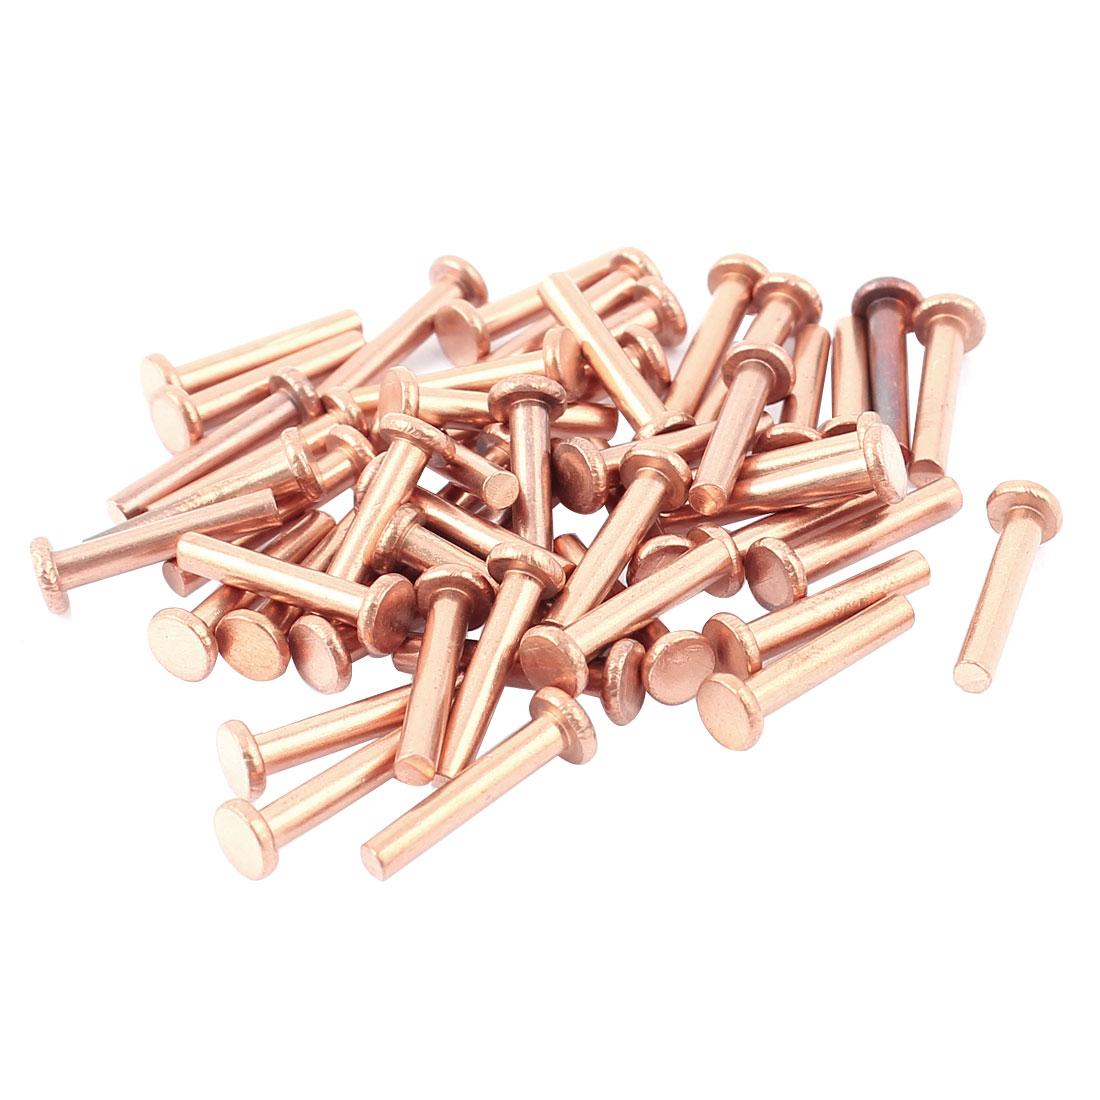 "50 Pcs 1/8"" Diameter 5/8"" Long Shank Flat Head Bolts Copper Solid Rivets Fasteners"